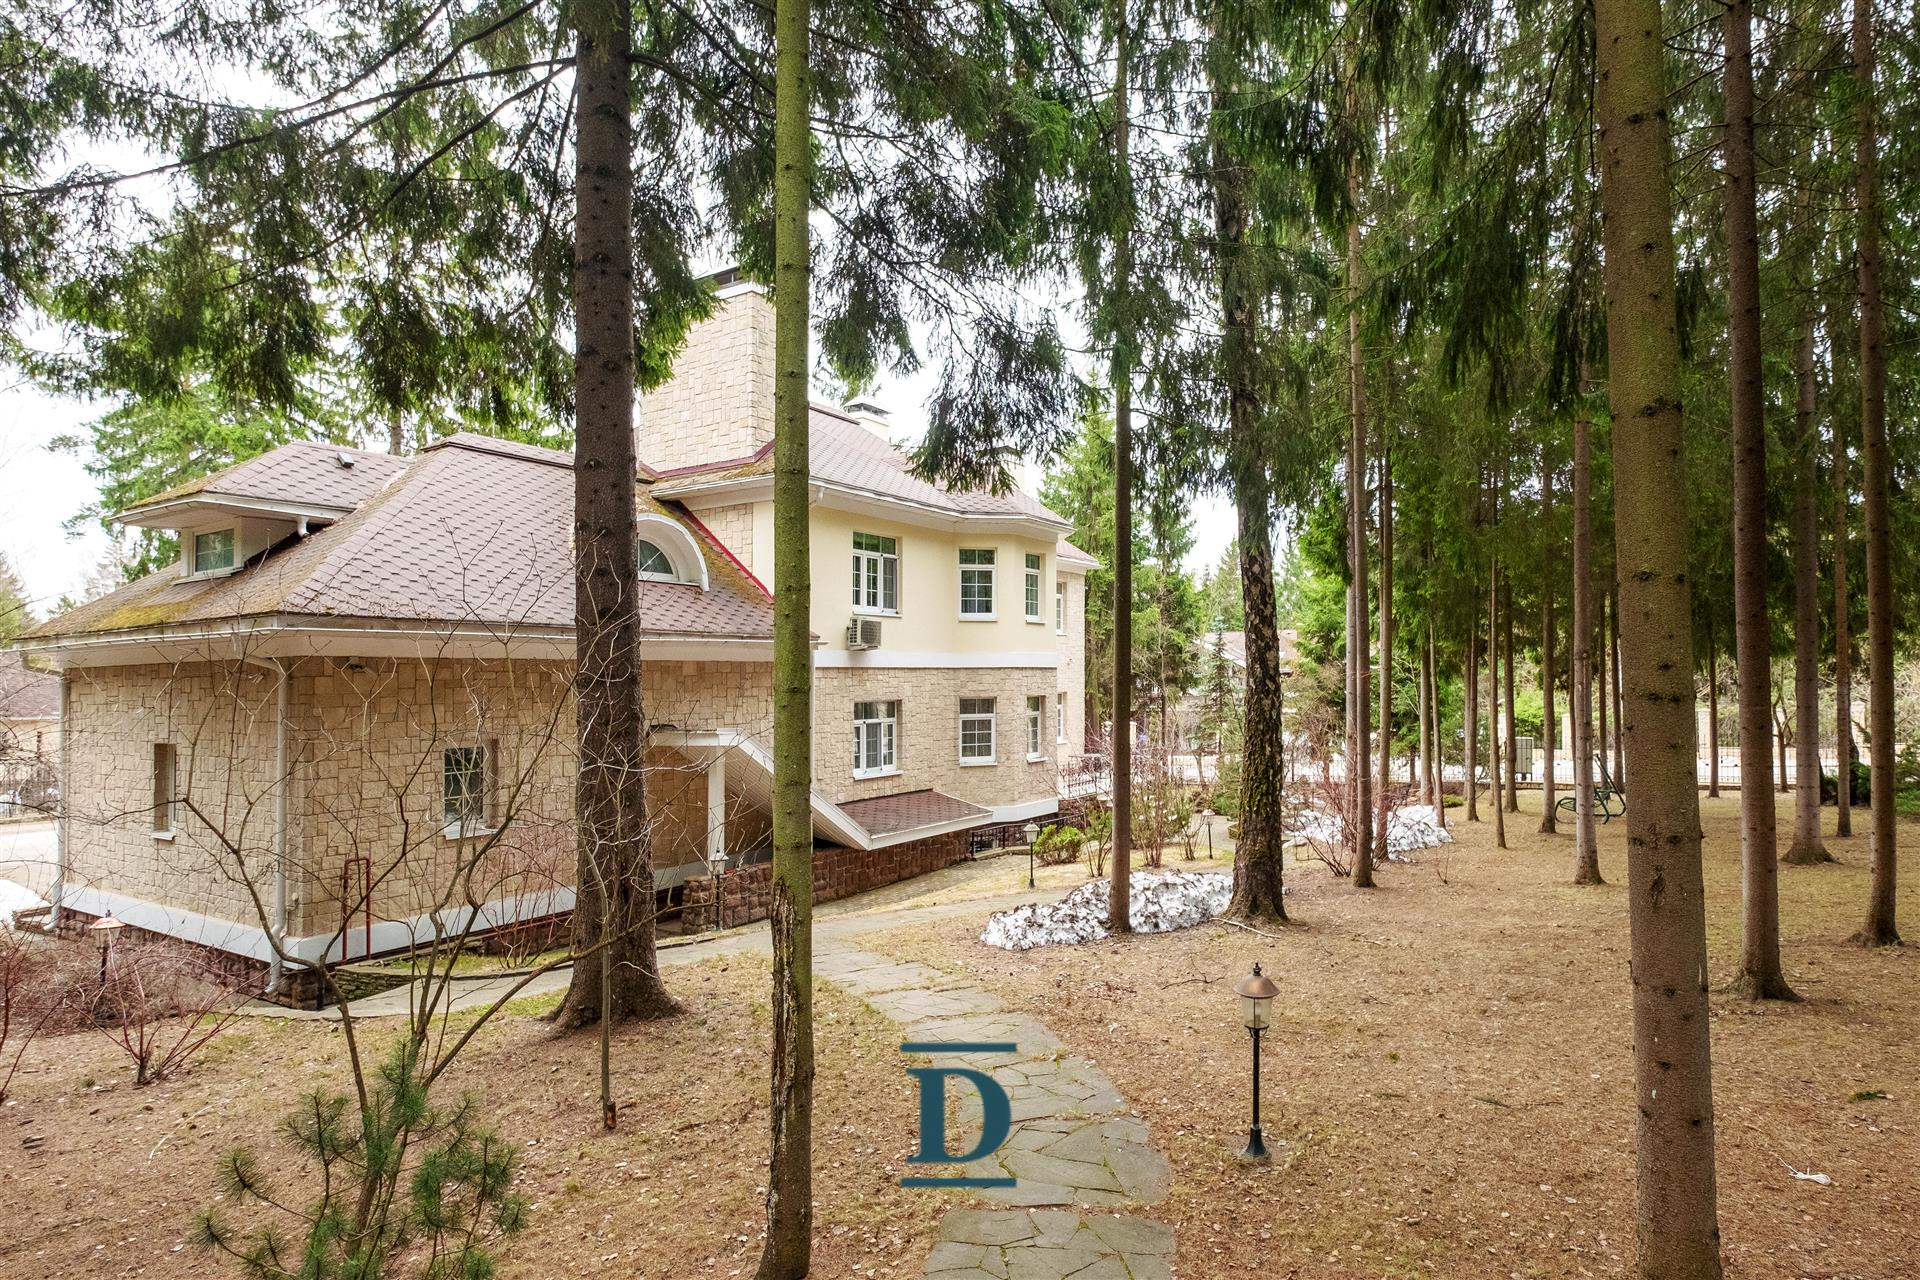 дом ID-297 в коттеджном посёлке Шервуд